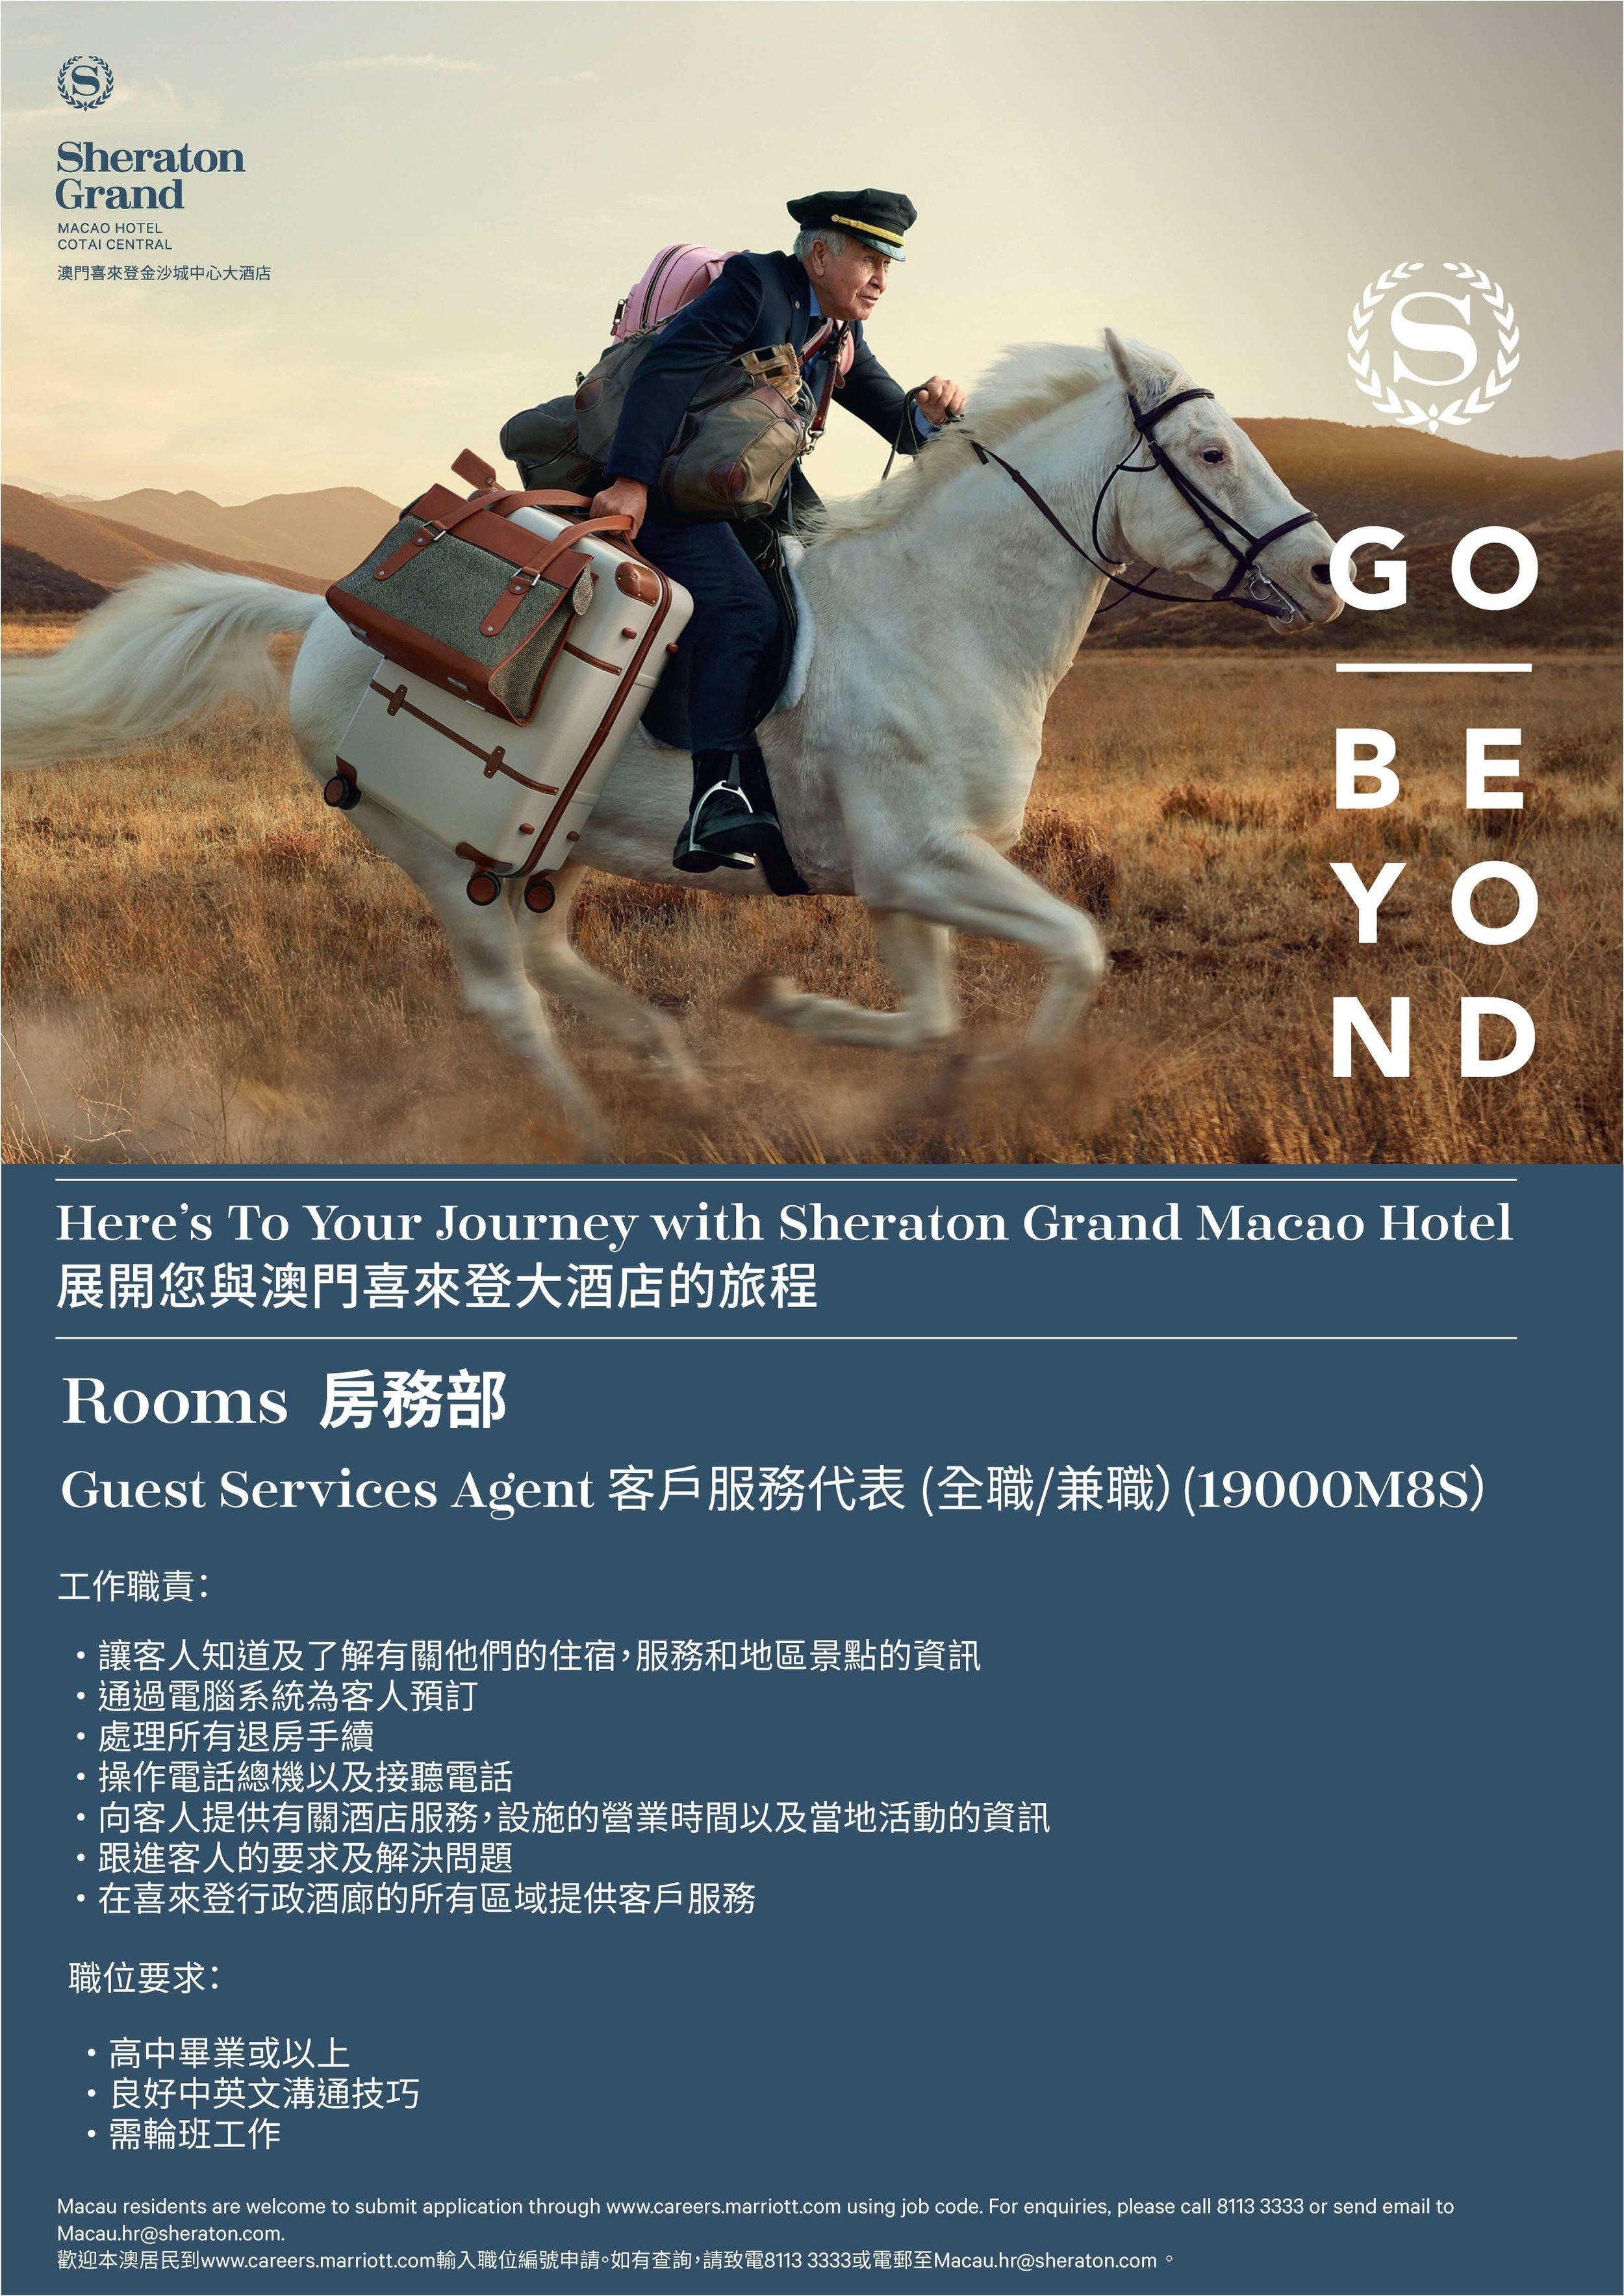 Sheraton External Posting - v1 - GSA (Macau HR).jpg